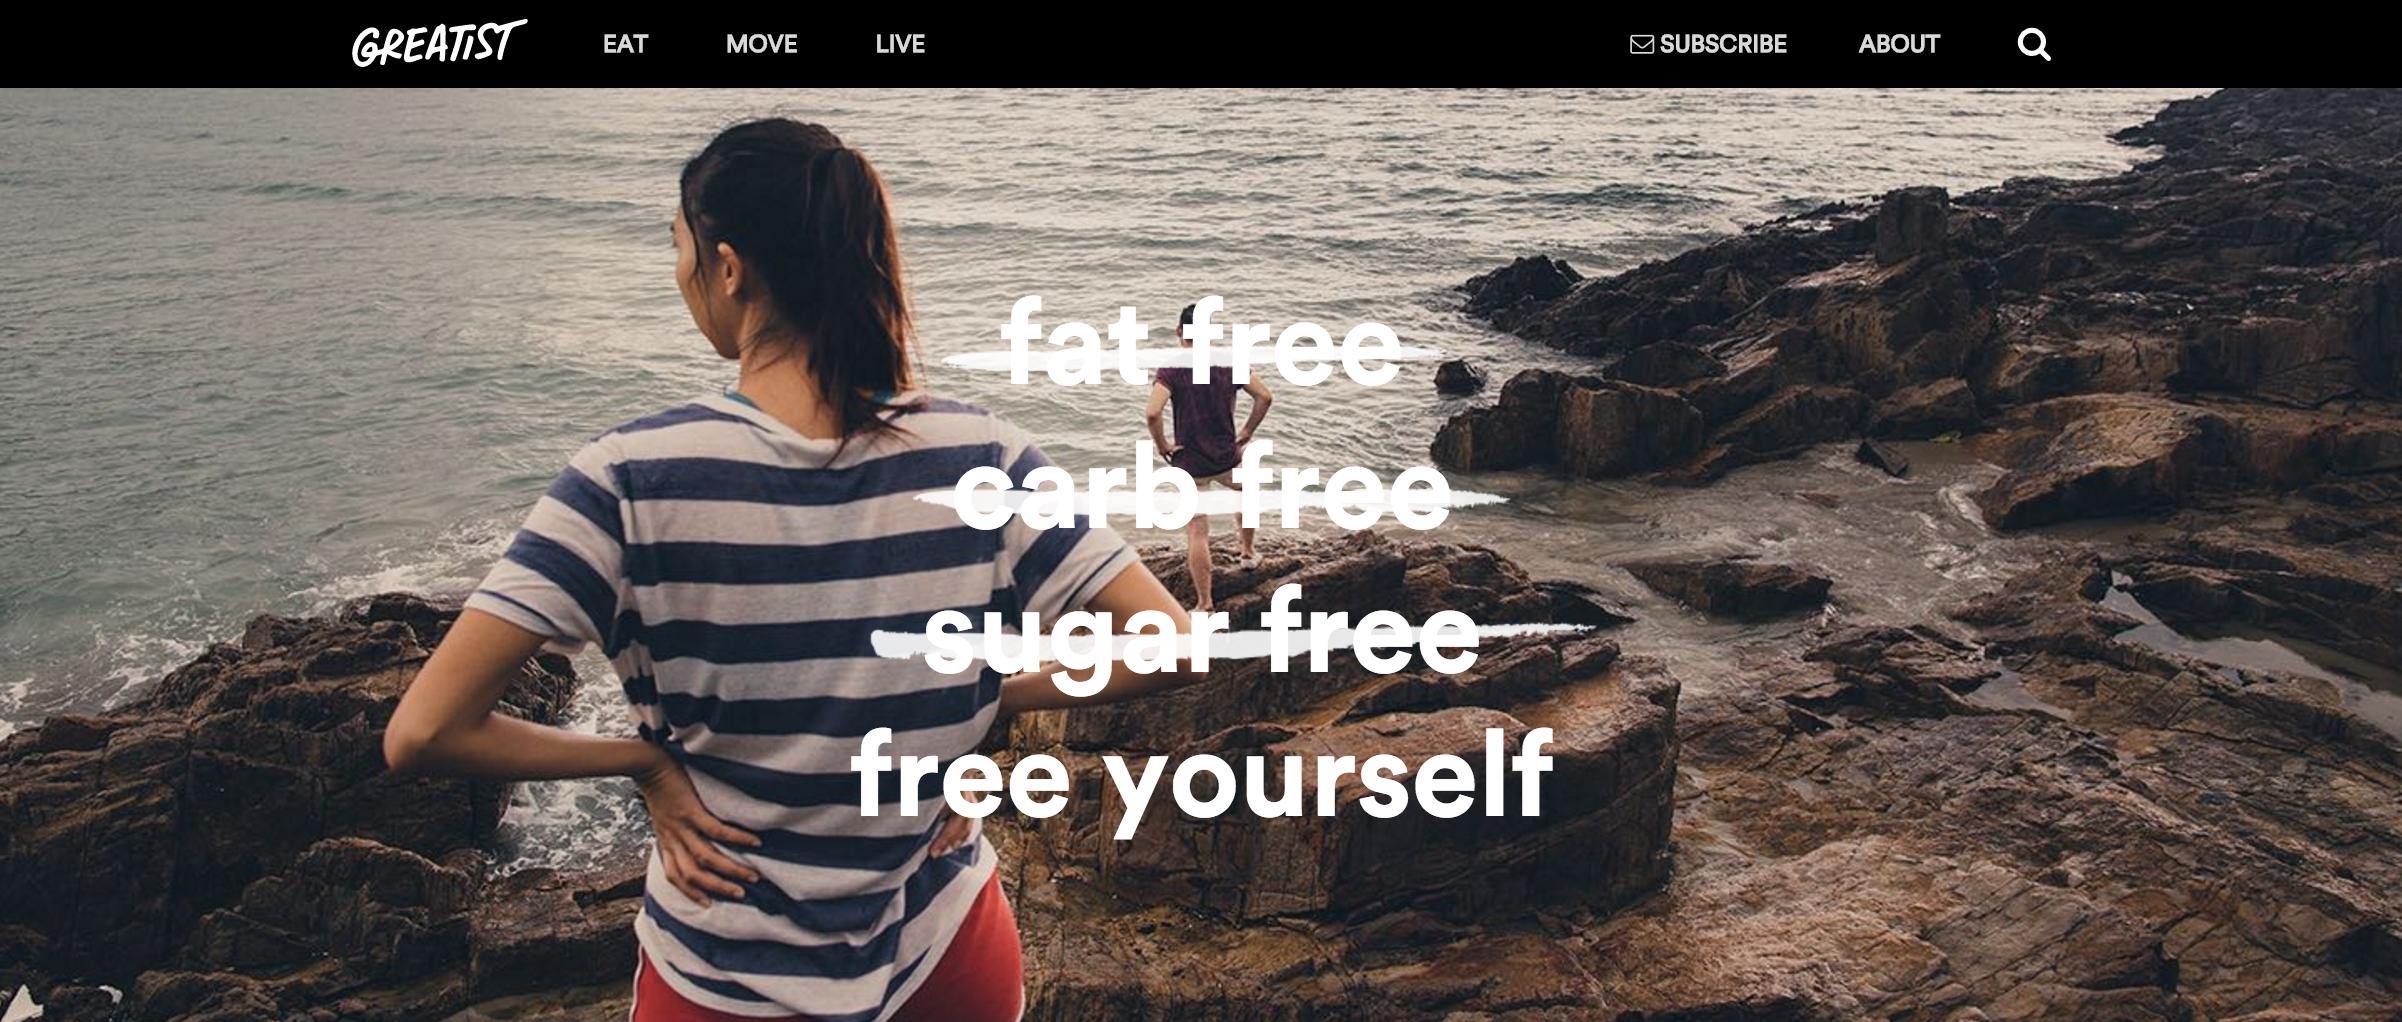 The message of health website Greatist.com.